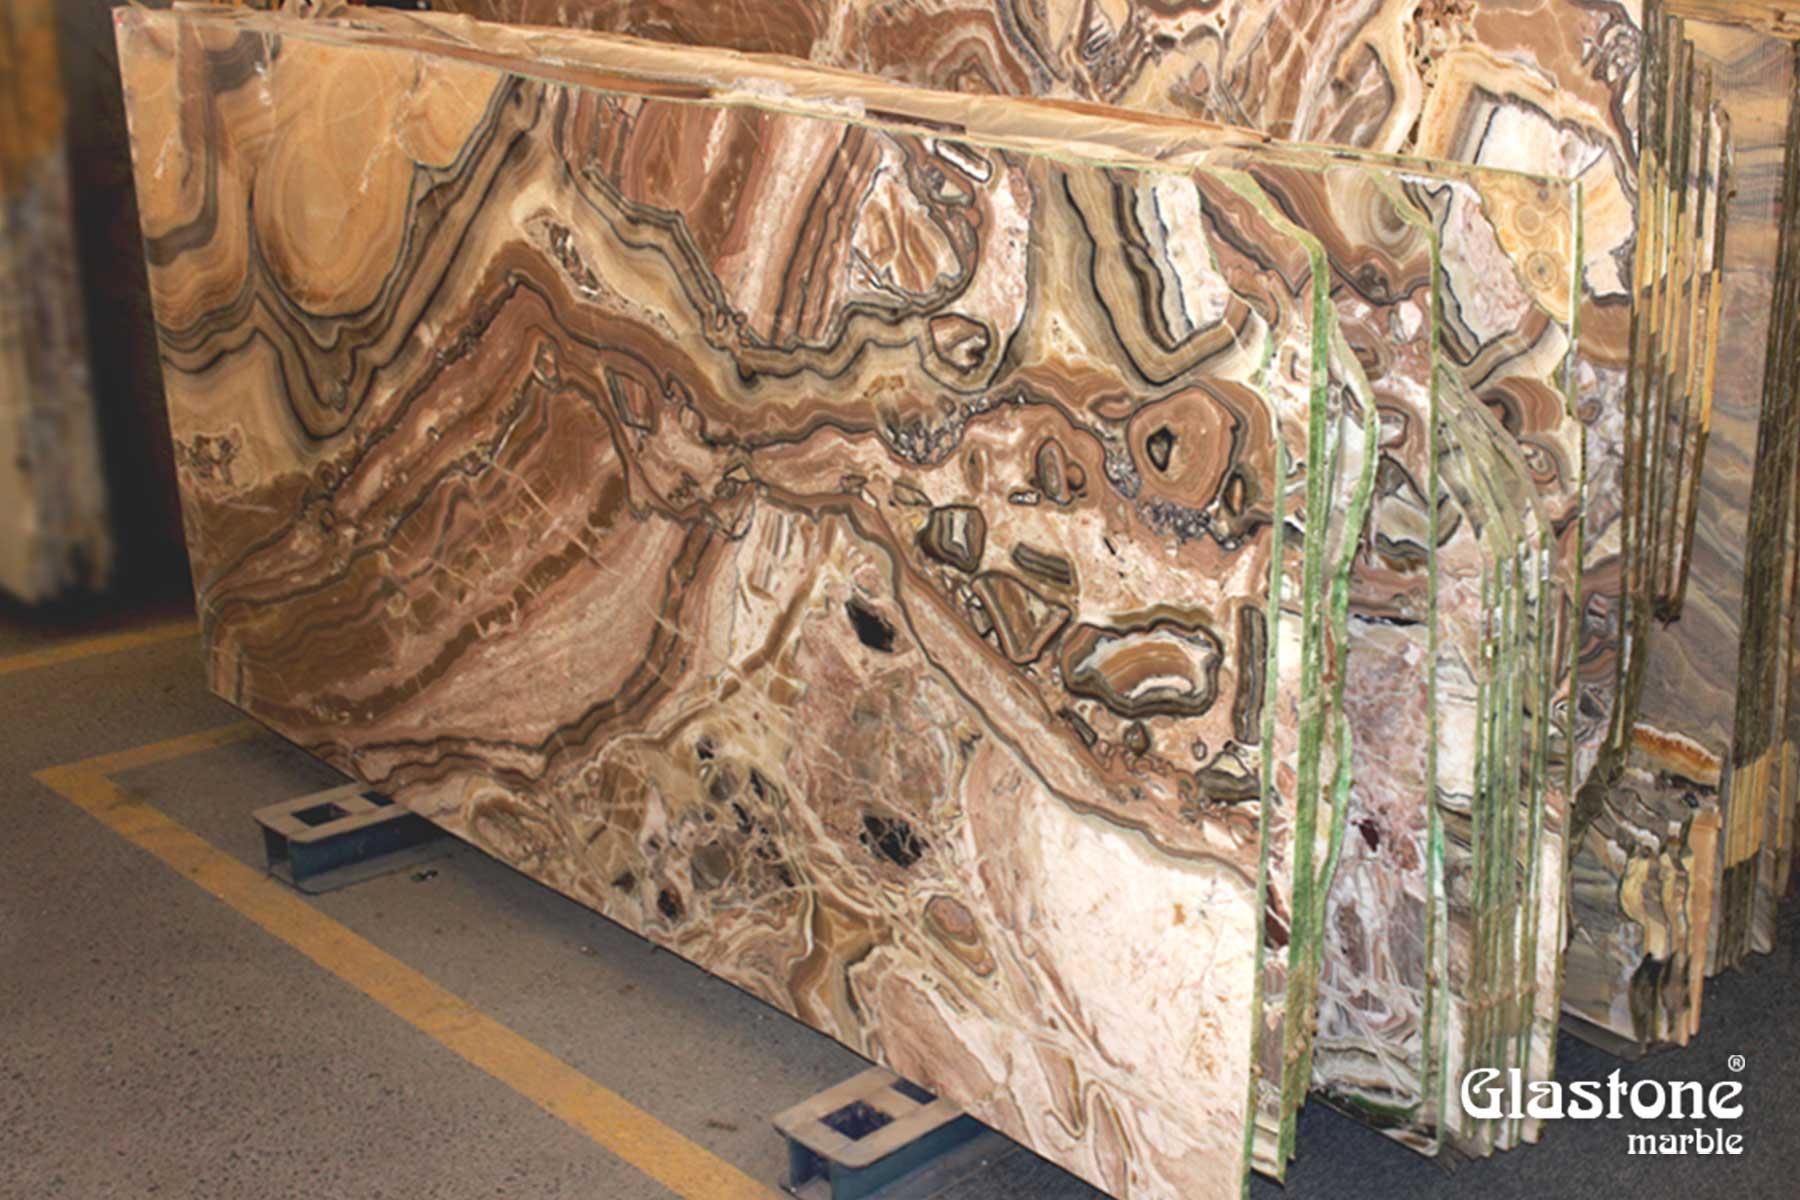 glastone marble marmol solerialaminado vidrio marmol natural onyx royal